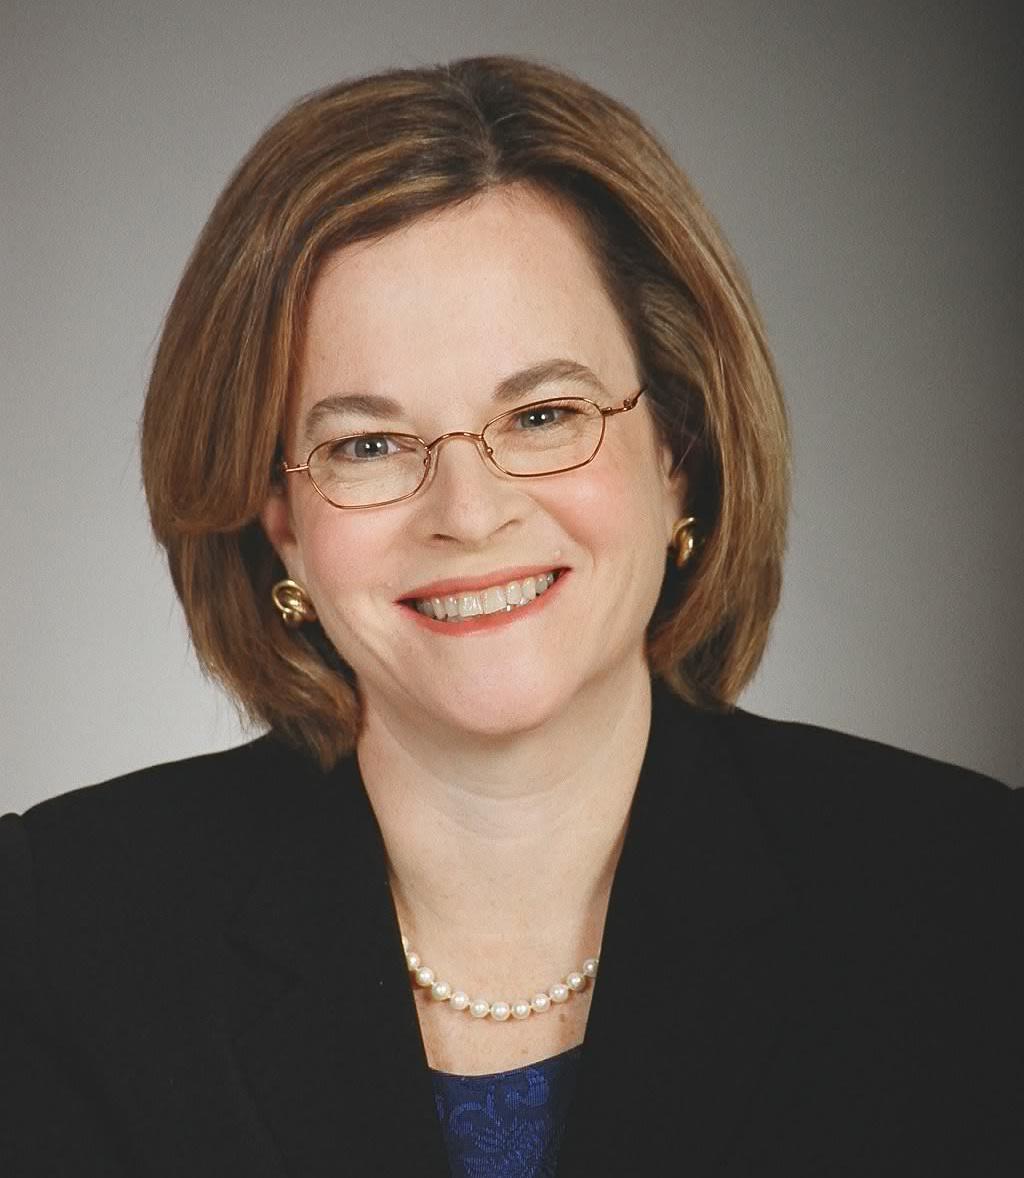 Debra Haffner